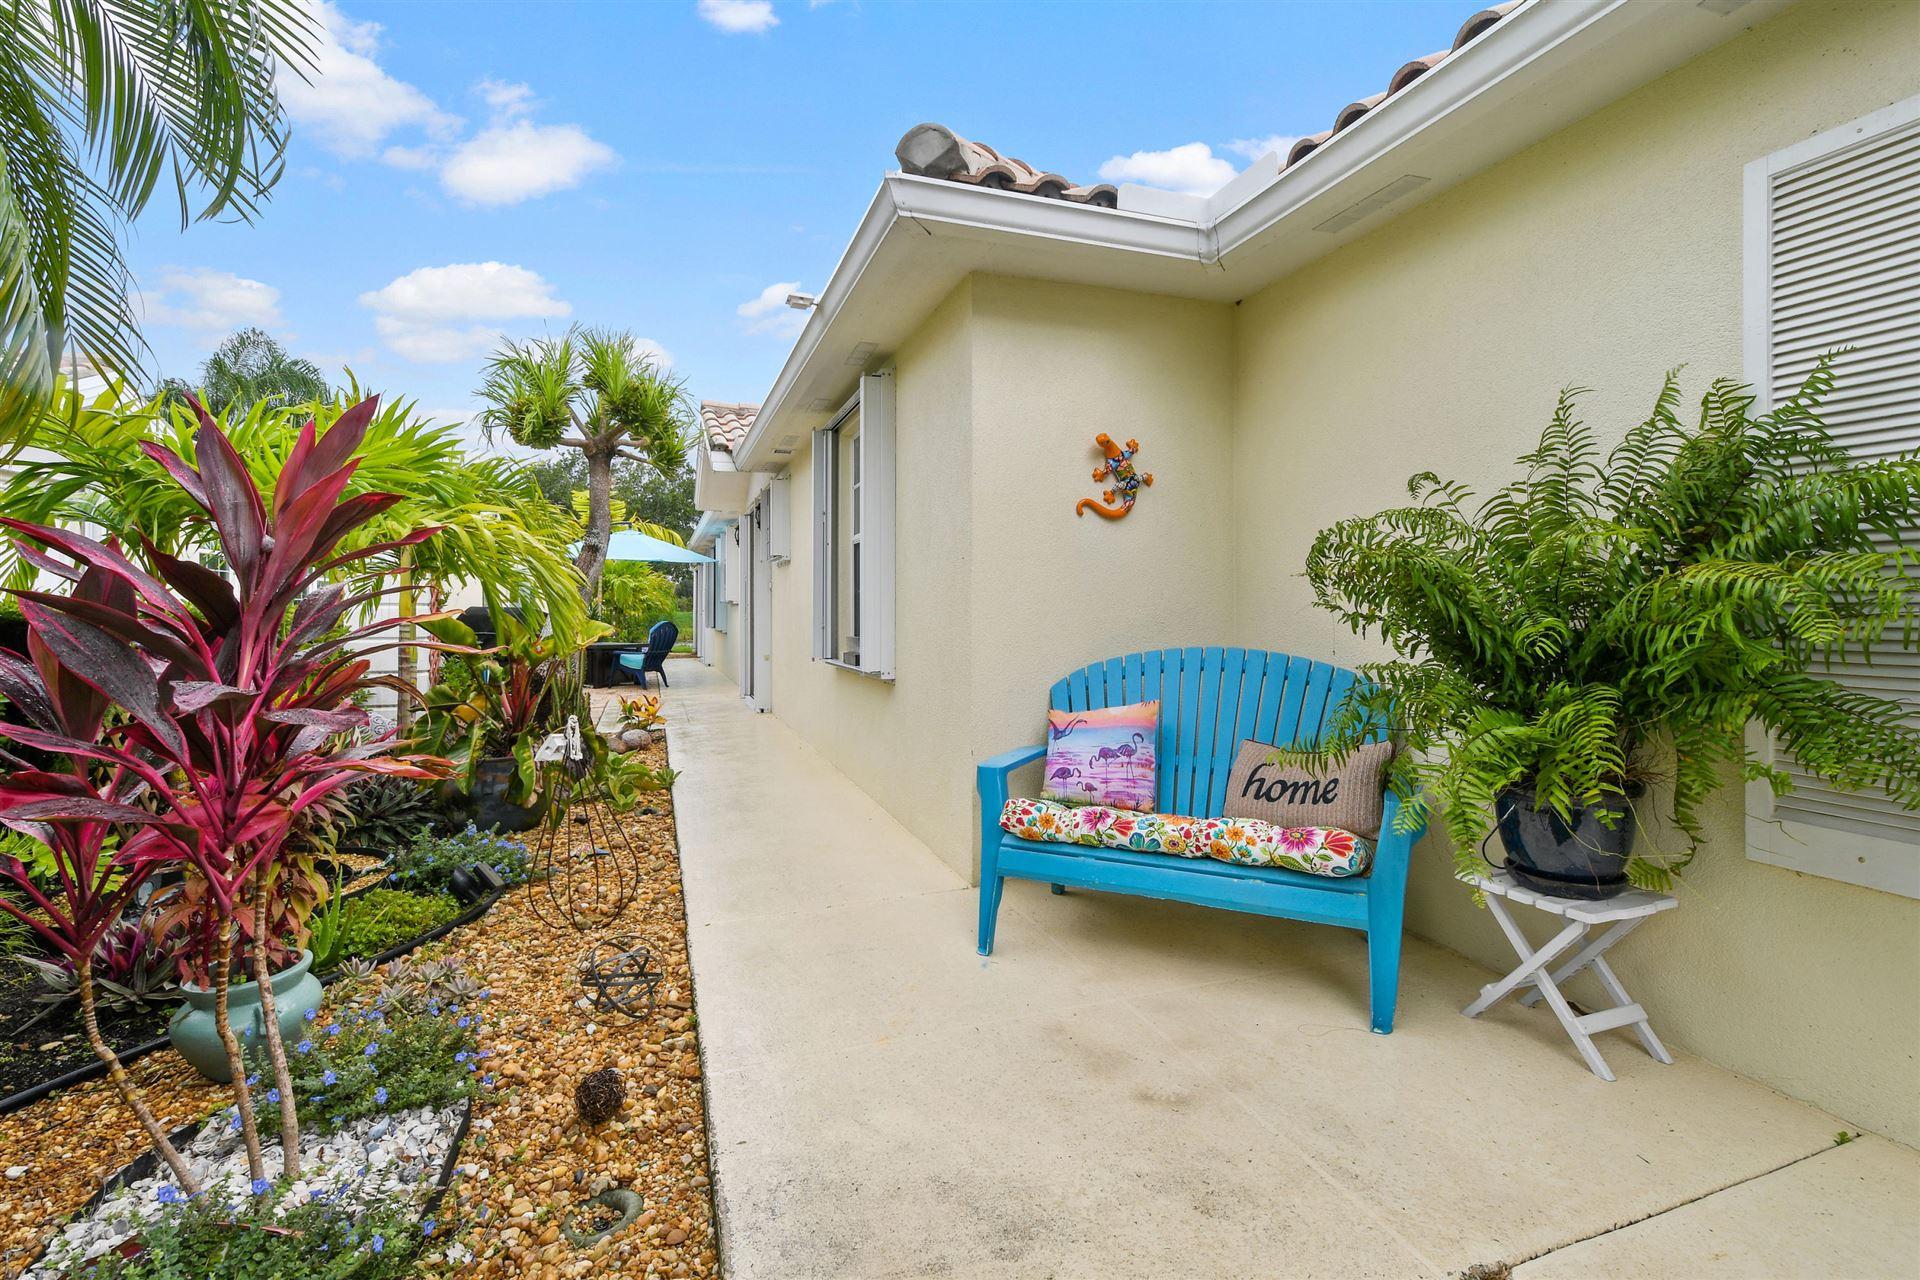 Photo of 8072 SE Peppercorn Court, Hobe Sound, FL 33455 (MLS # RX-10646396)